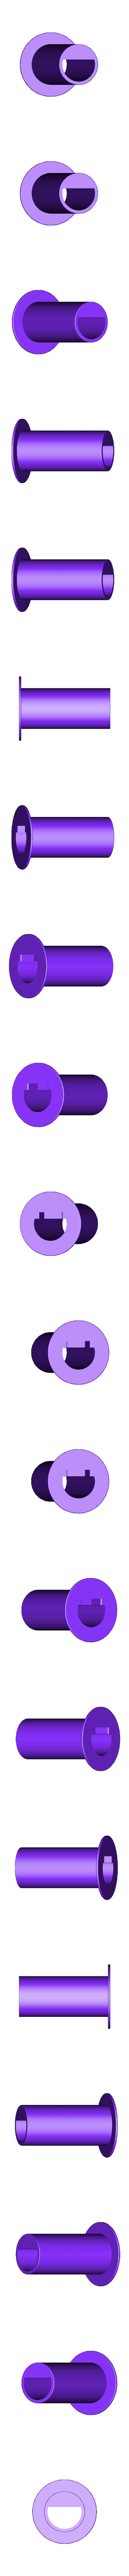 SUPPORT BOBINE Q5 v2.stl Download free STL file flsun q5 coil holder • 3D print object, van_severen_ludo